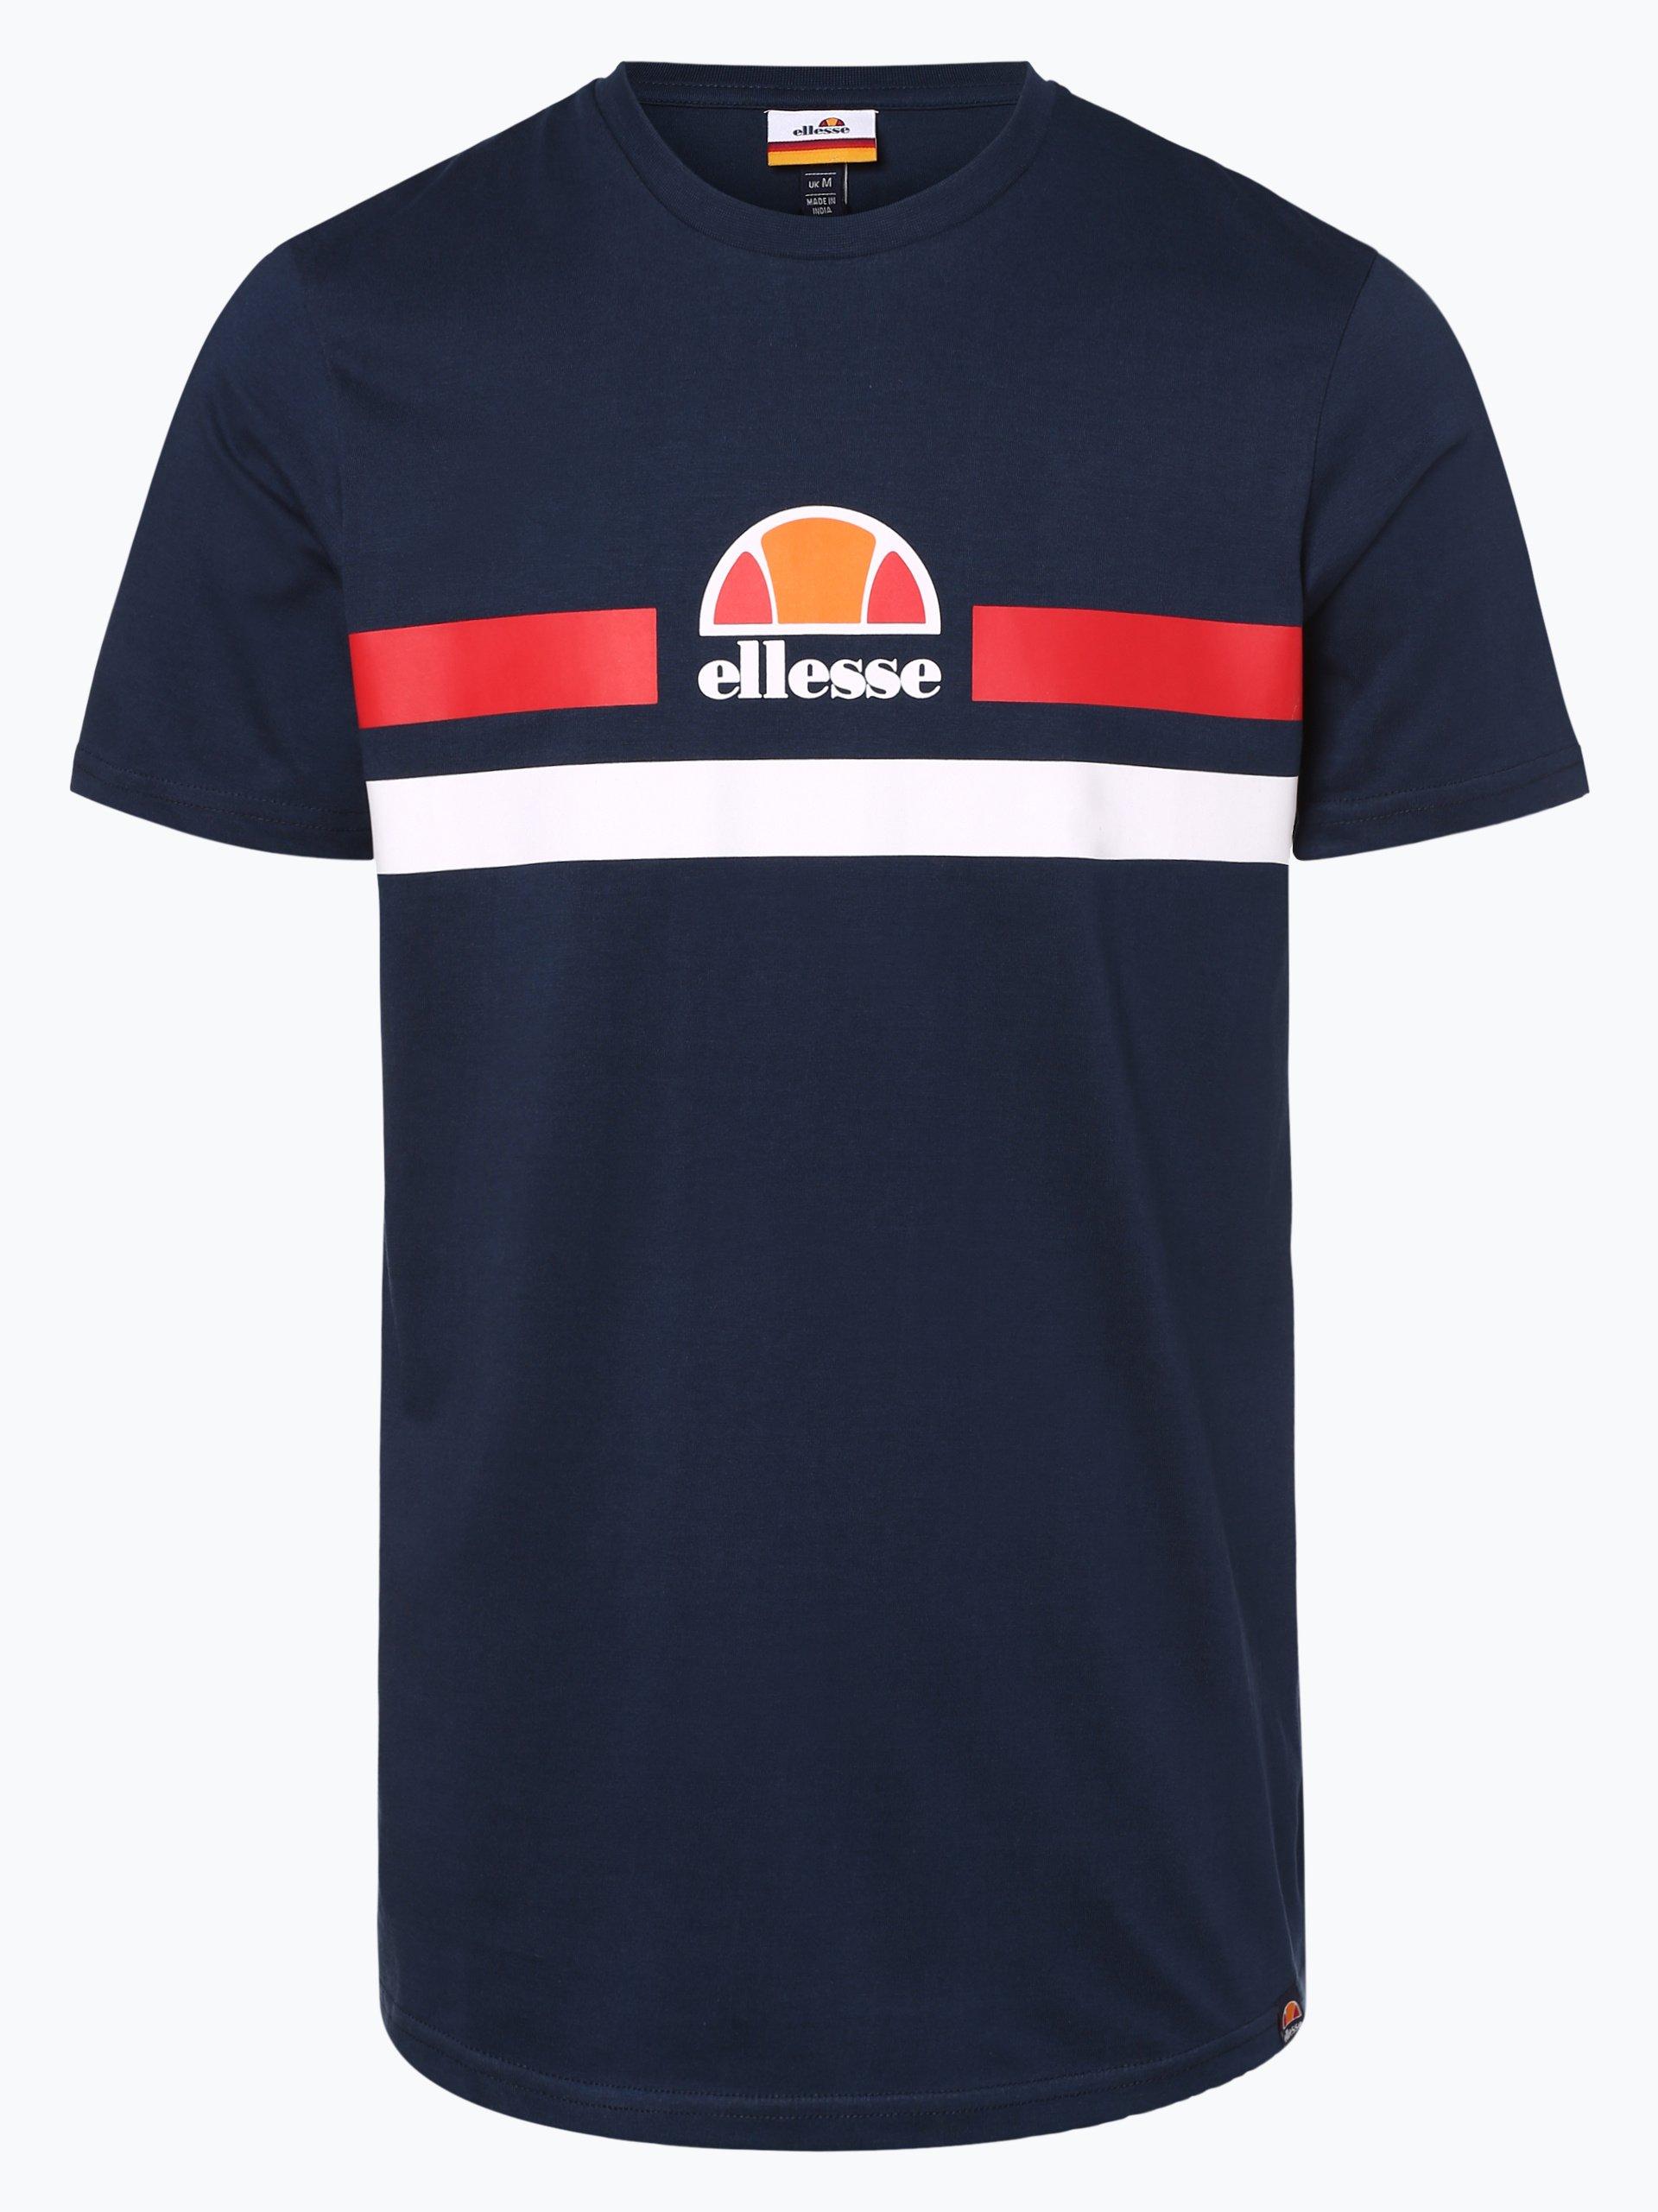 ellesse Herren T-Shirt - Aprel